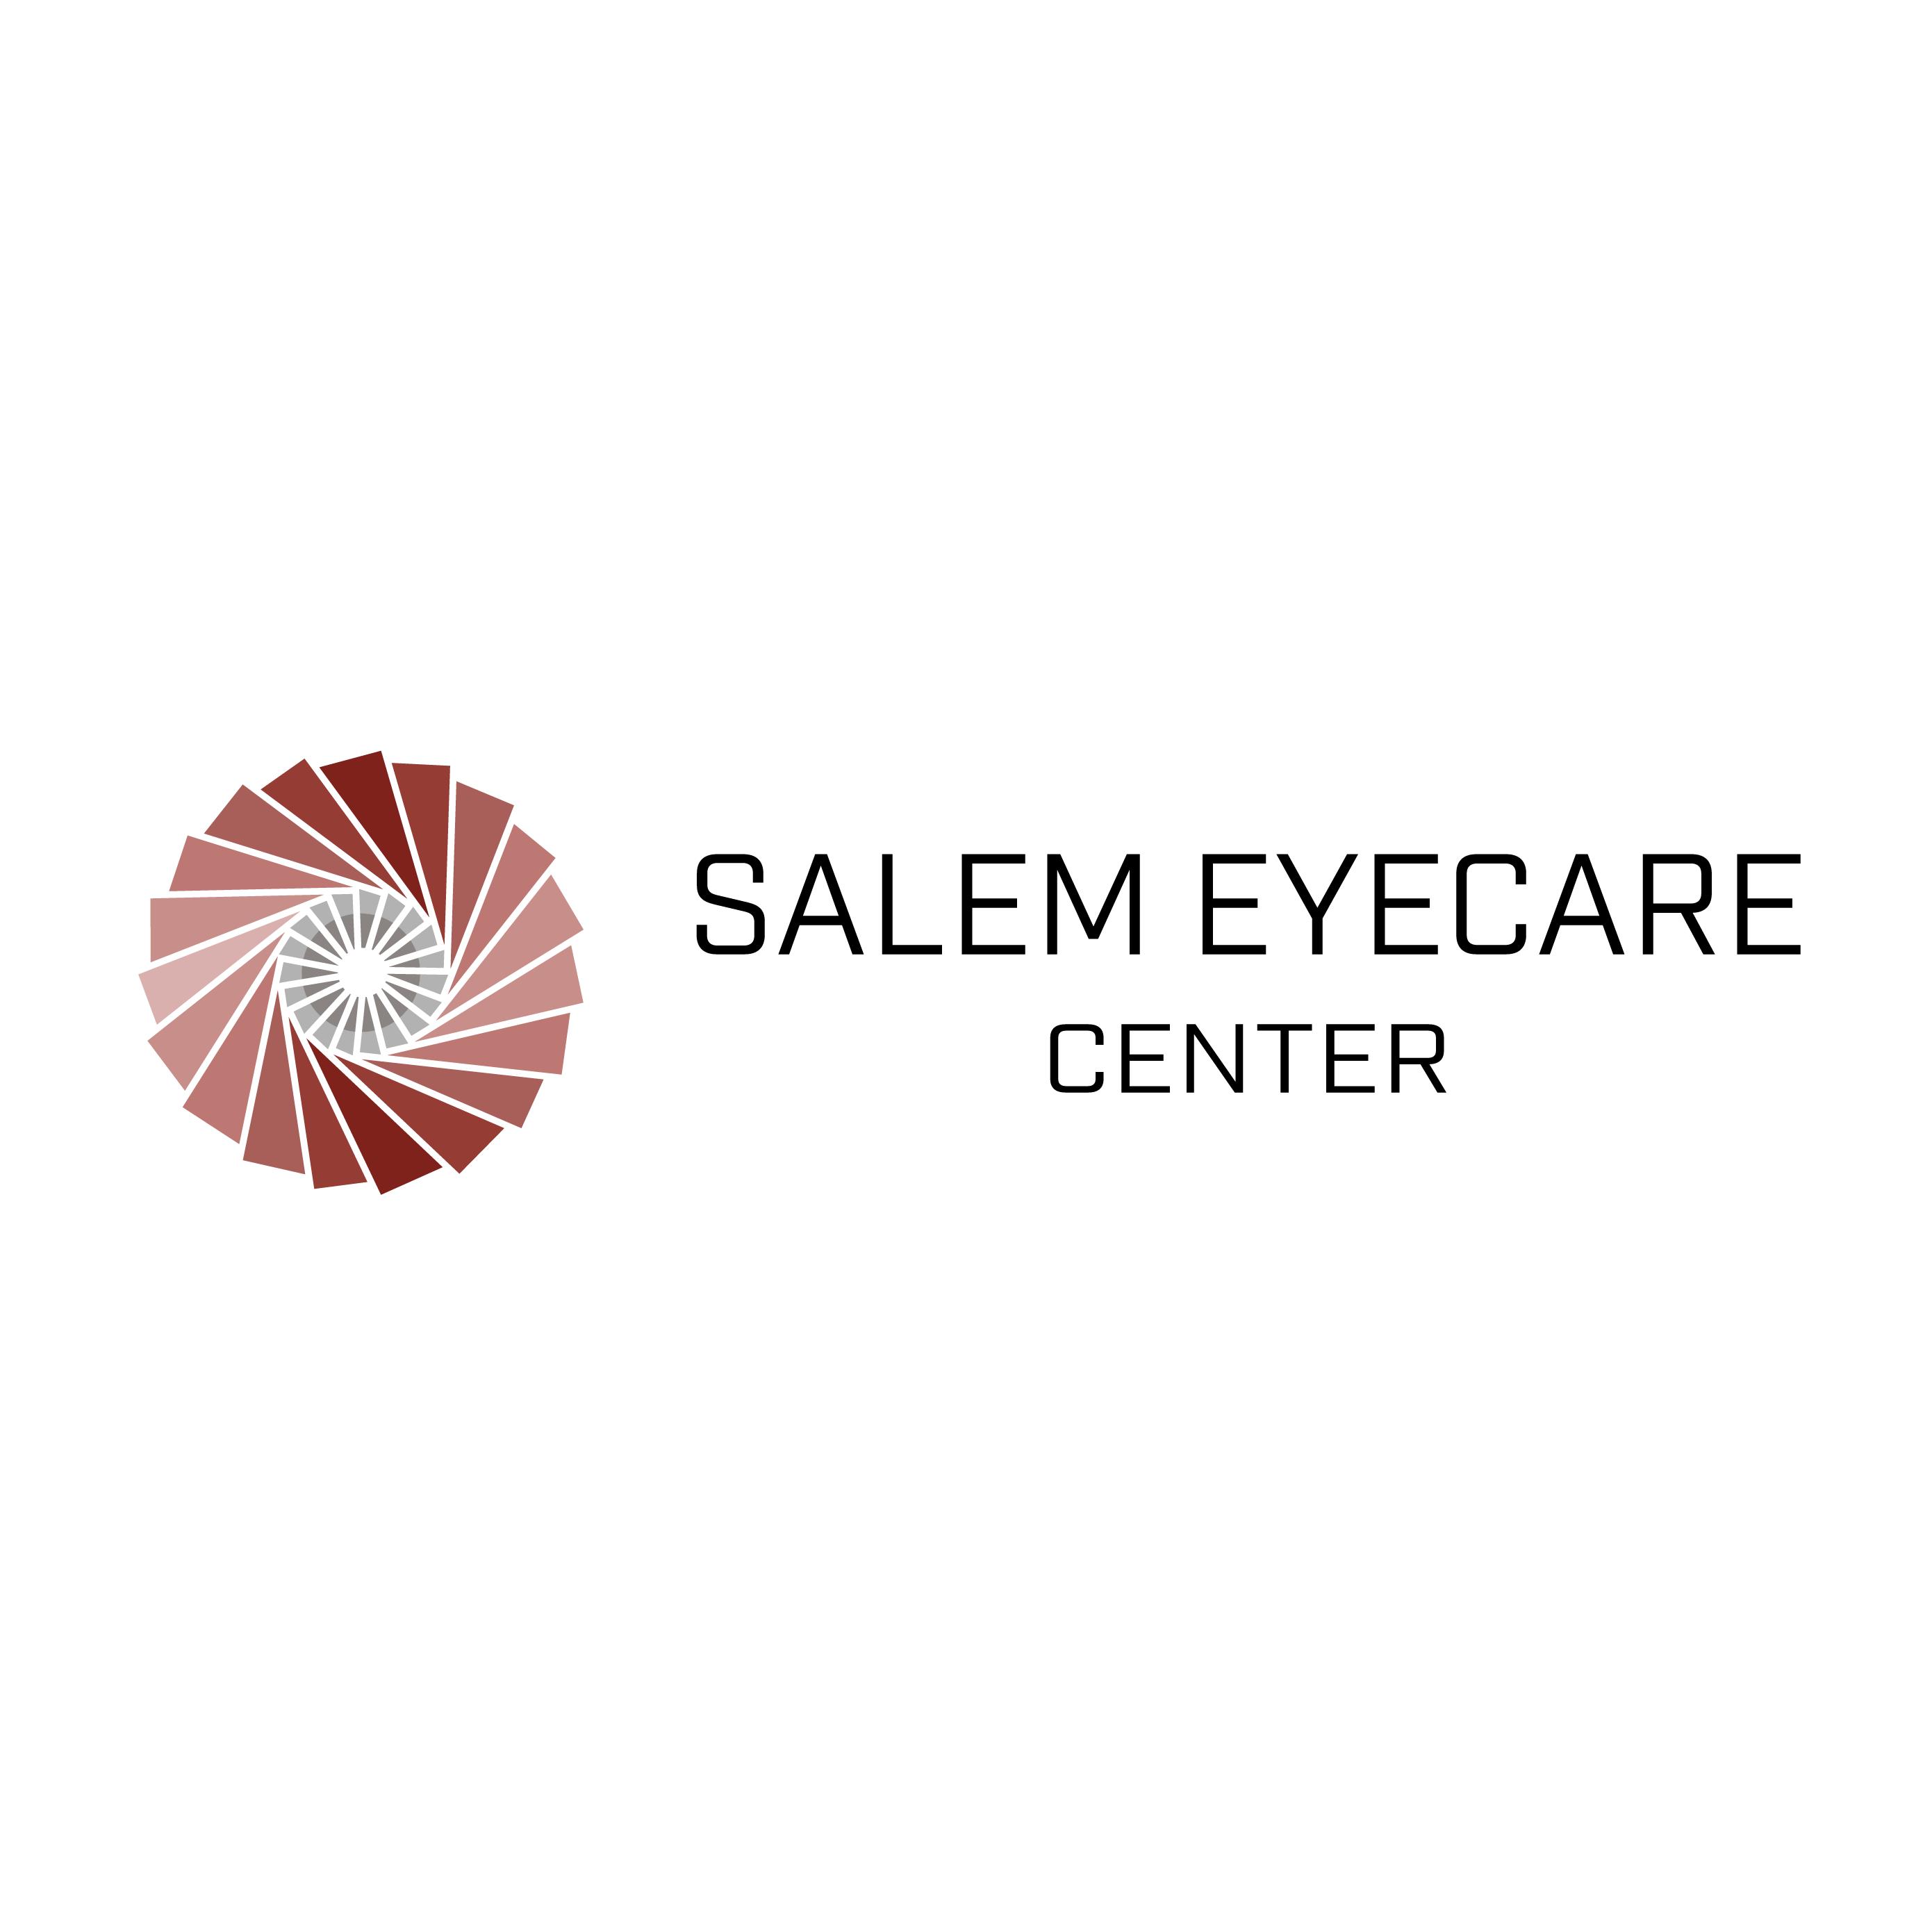 The Salem Eyecare Center